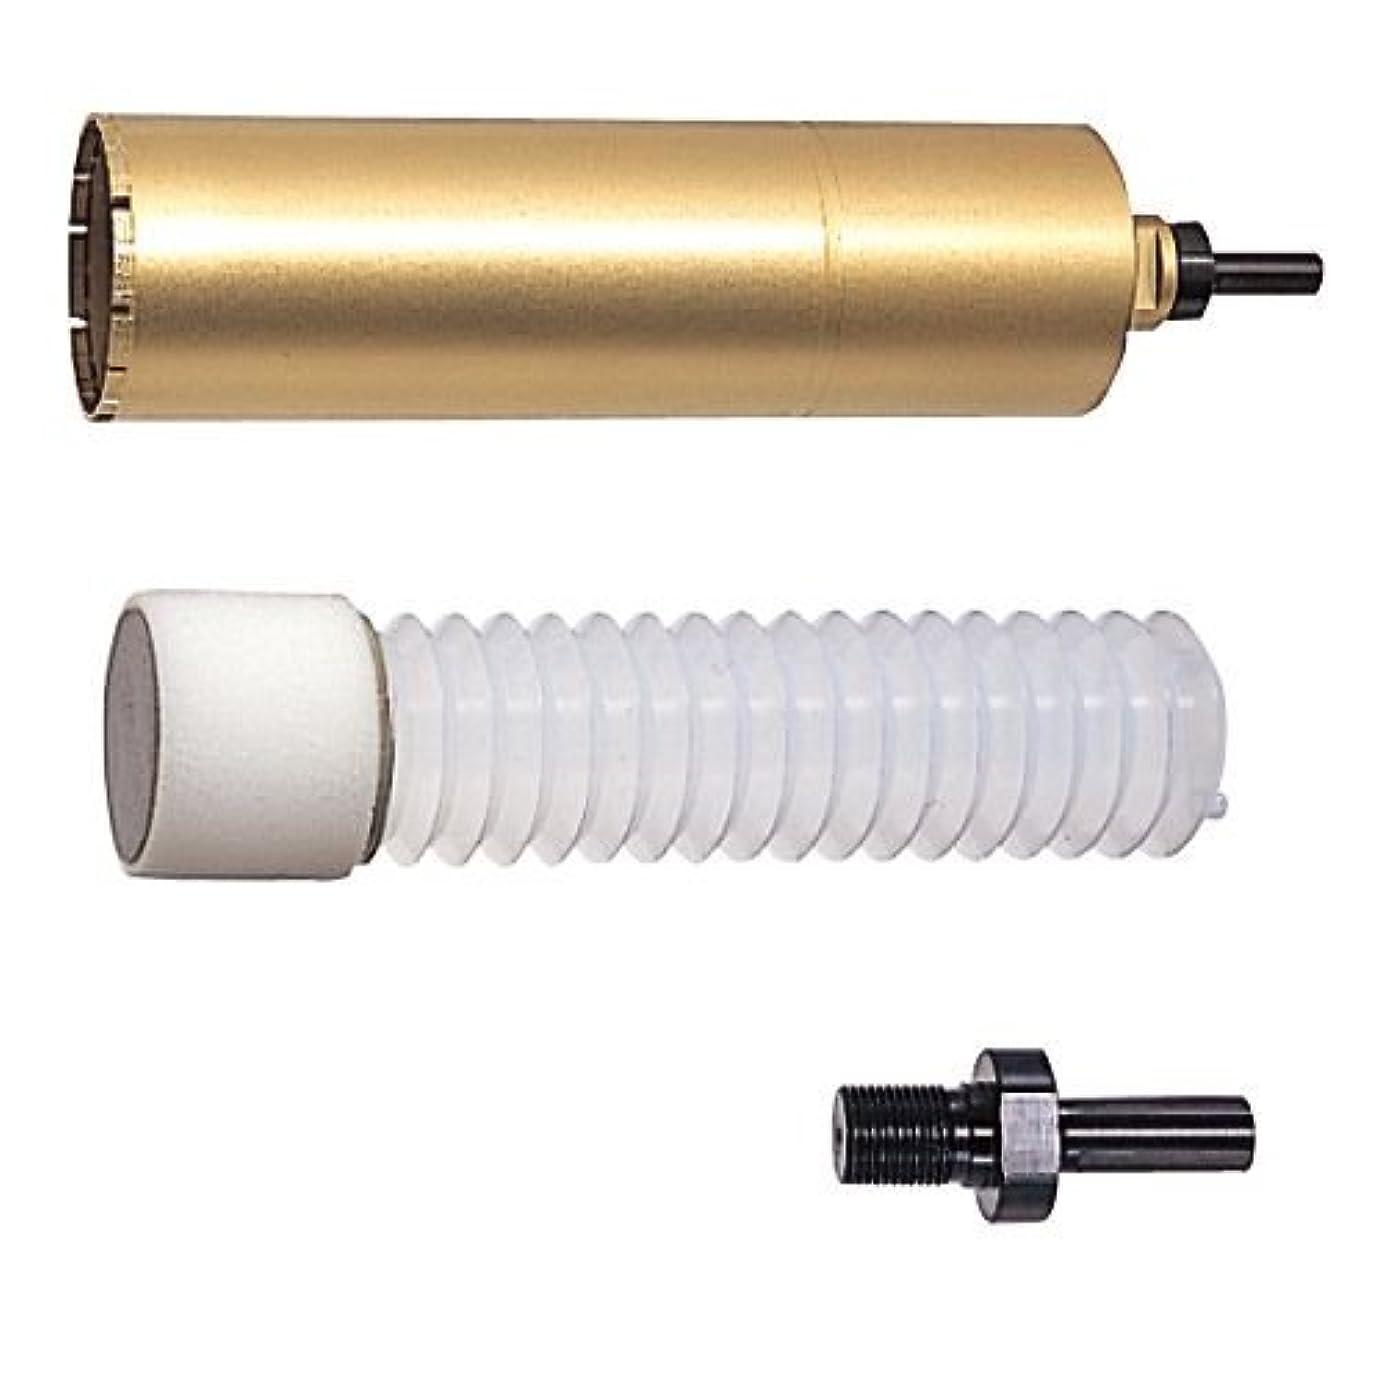 HiKOKI(旧日立工機) ダイヤモンドコアビット組 90mm 3-1/2″ (波形,湿式) 0031-2468